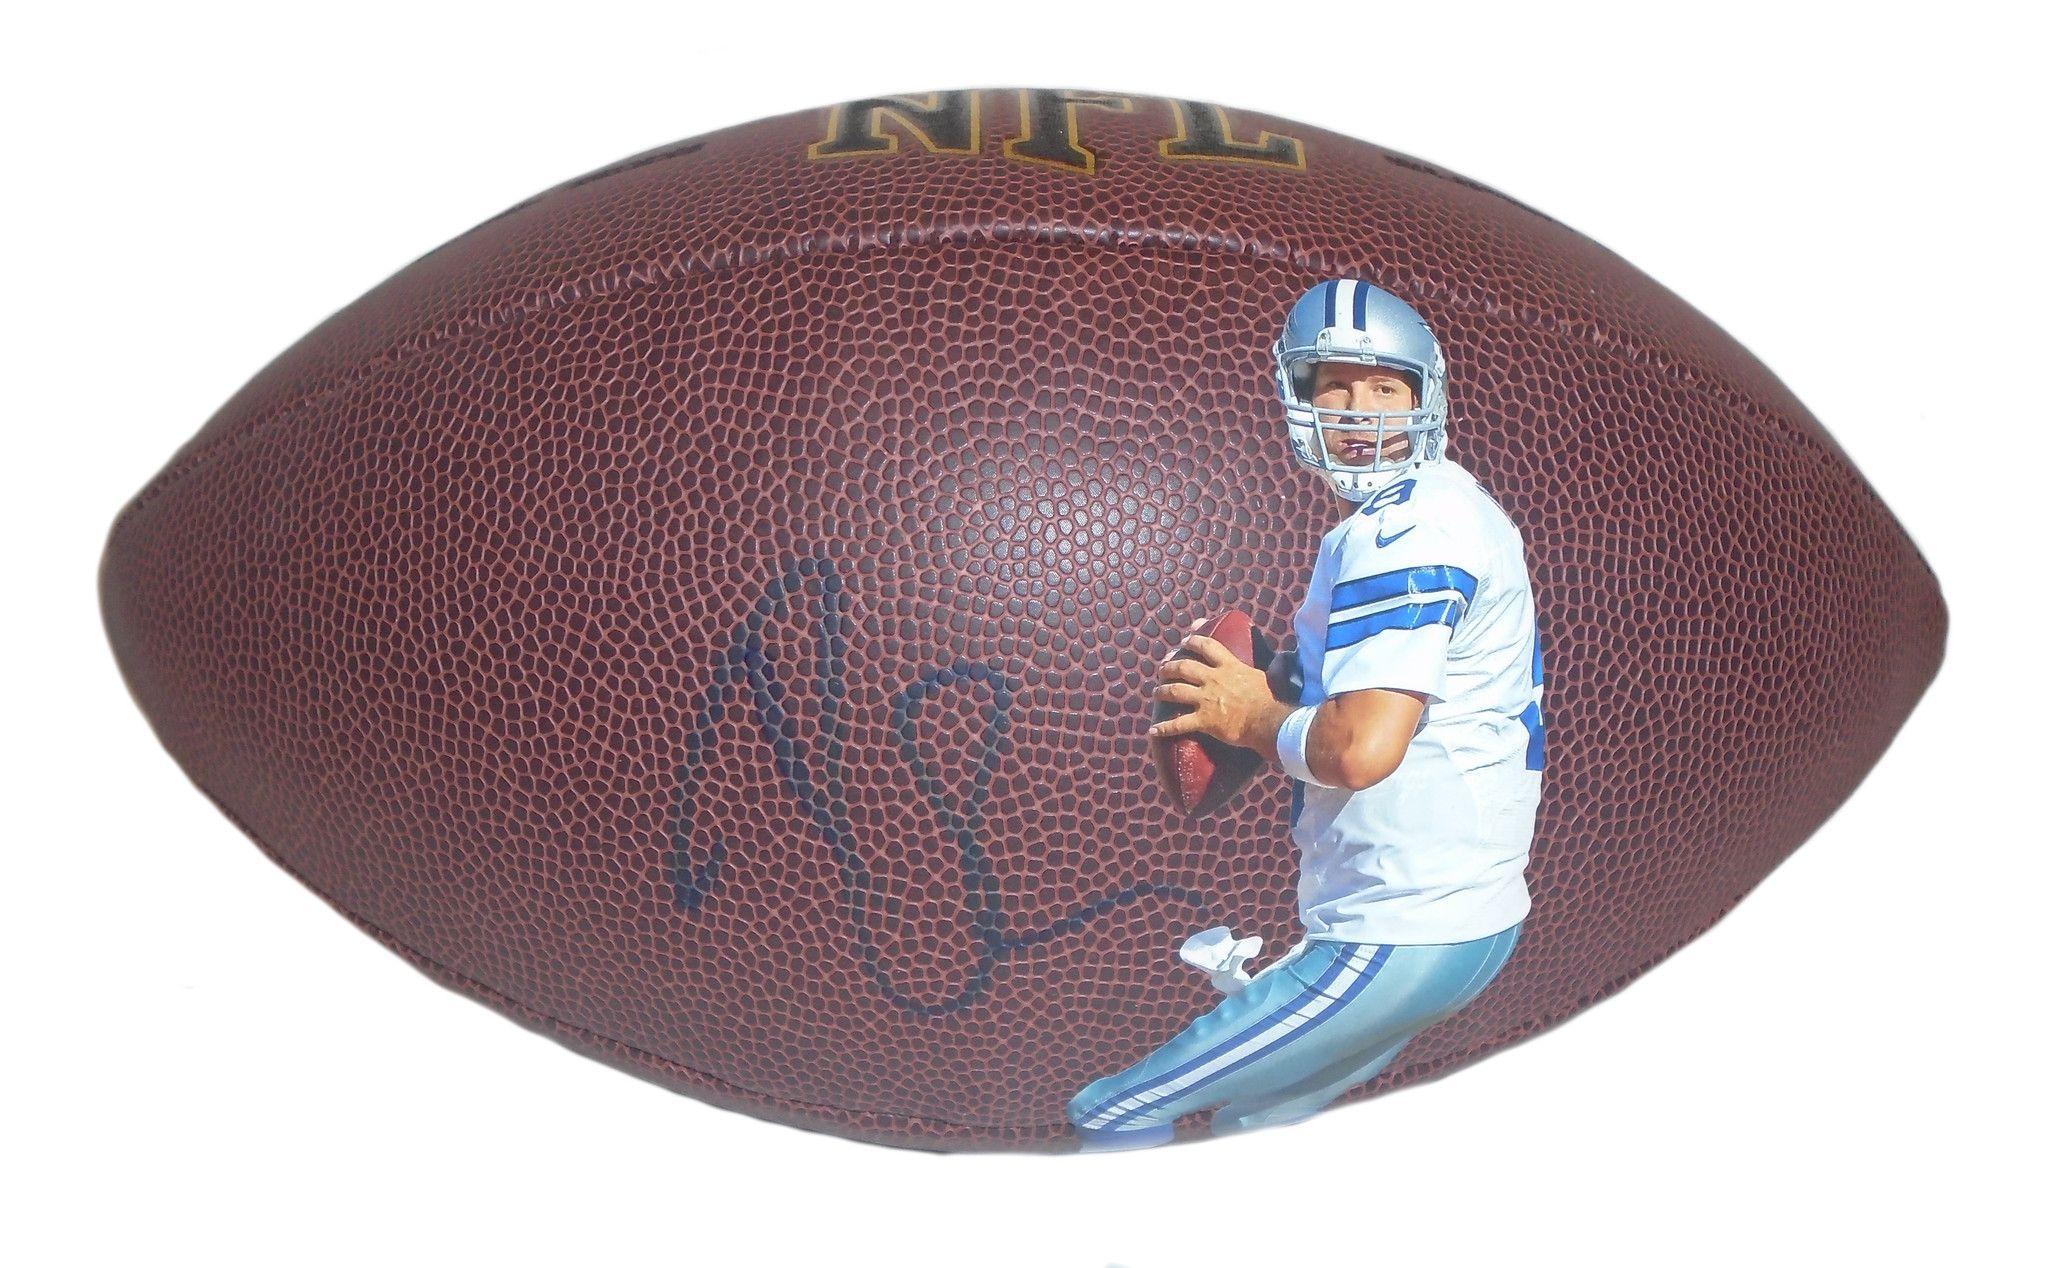 Tony Romo Autographed Dallas Cowboys Photo NFL Wilson Football ... 03d002396